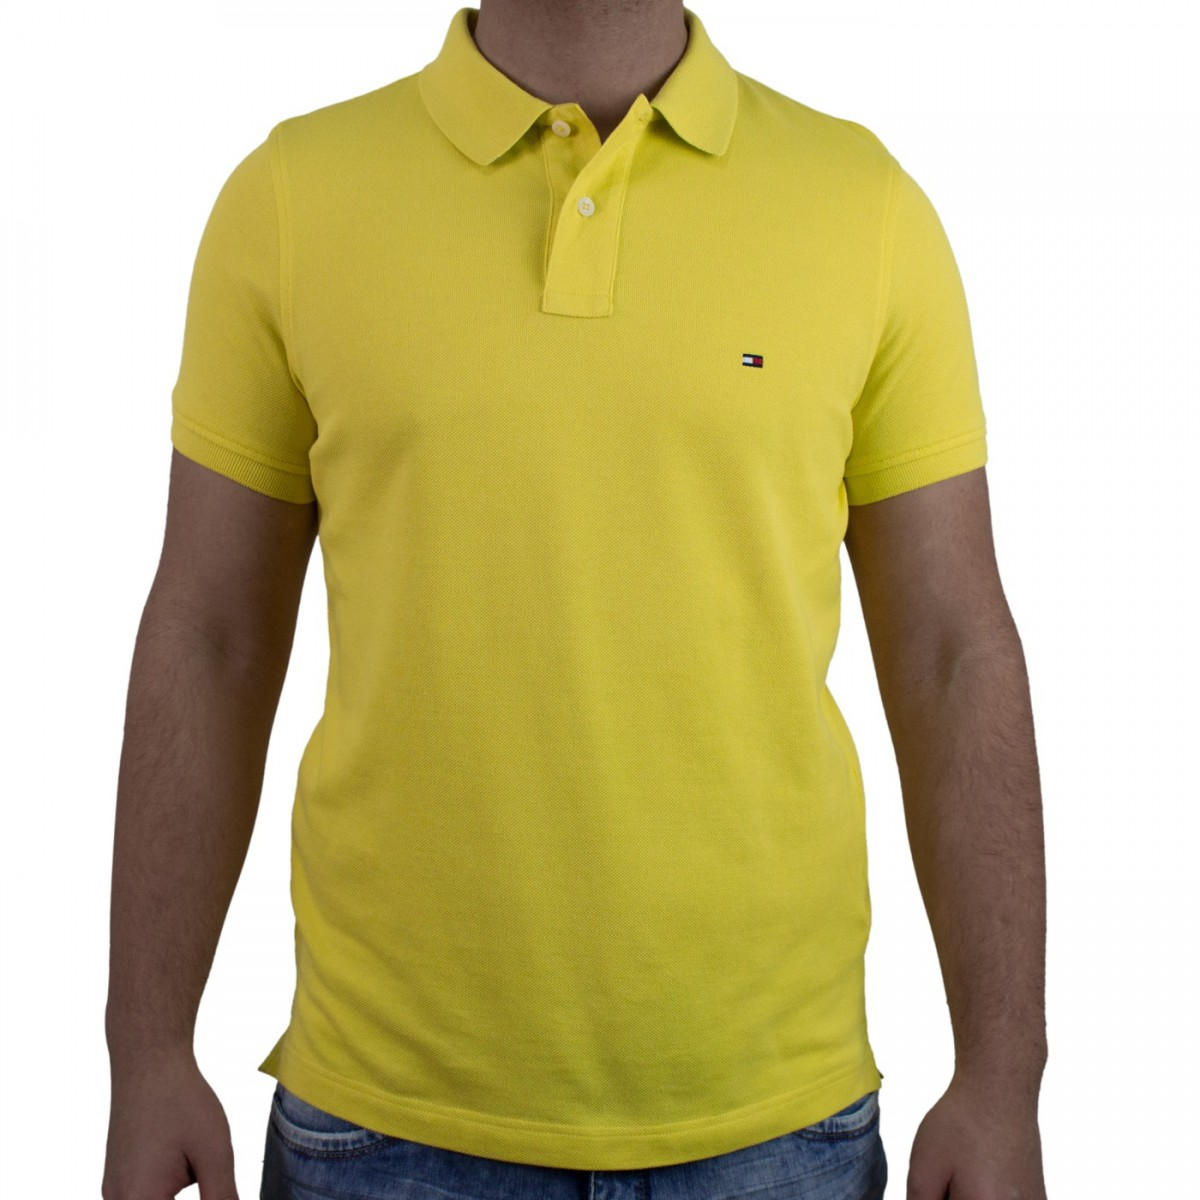 bdbb8dd403 Bizz Store - Camisa Polo Masculina Tommy Hilfiger Slim Manga Curta